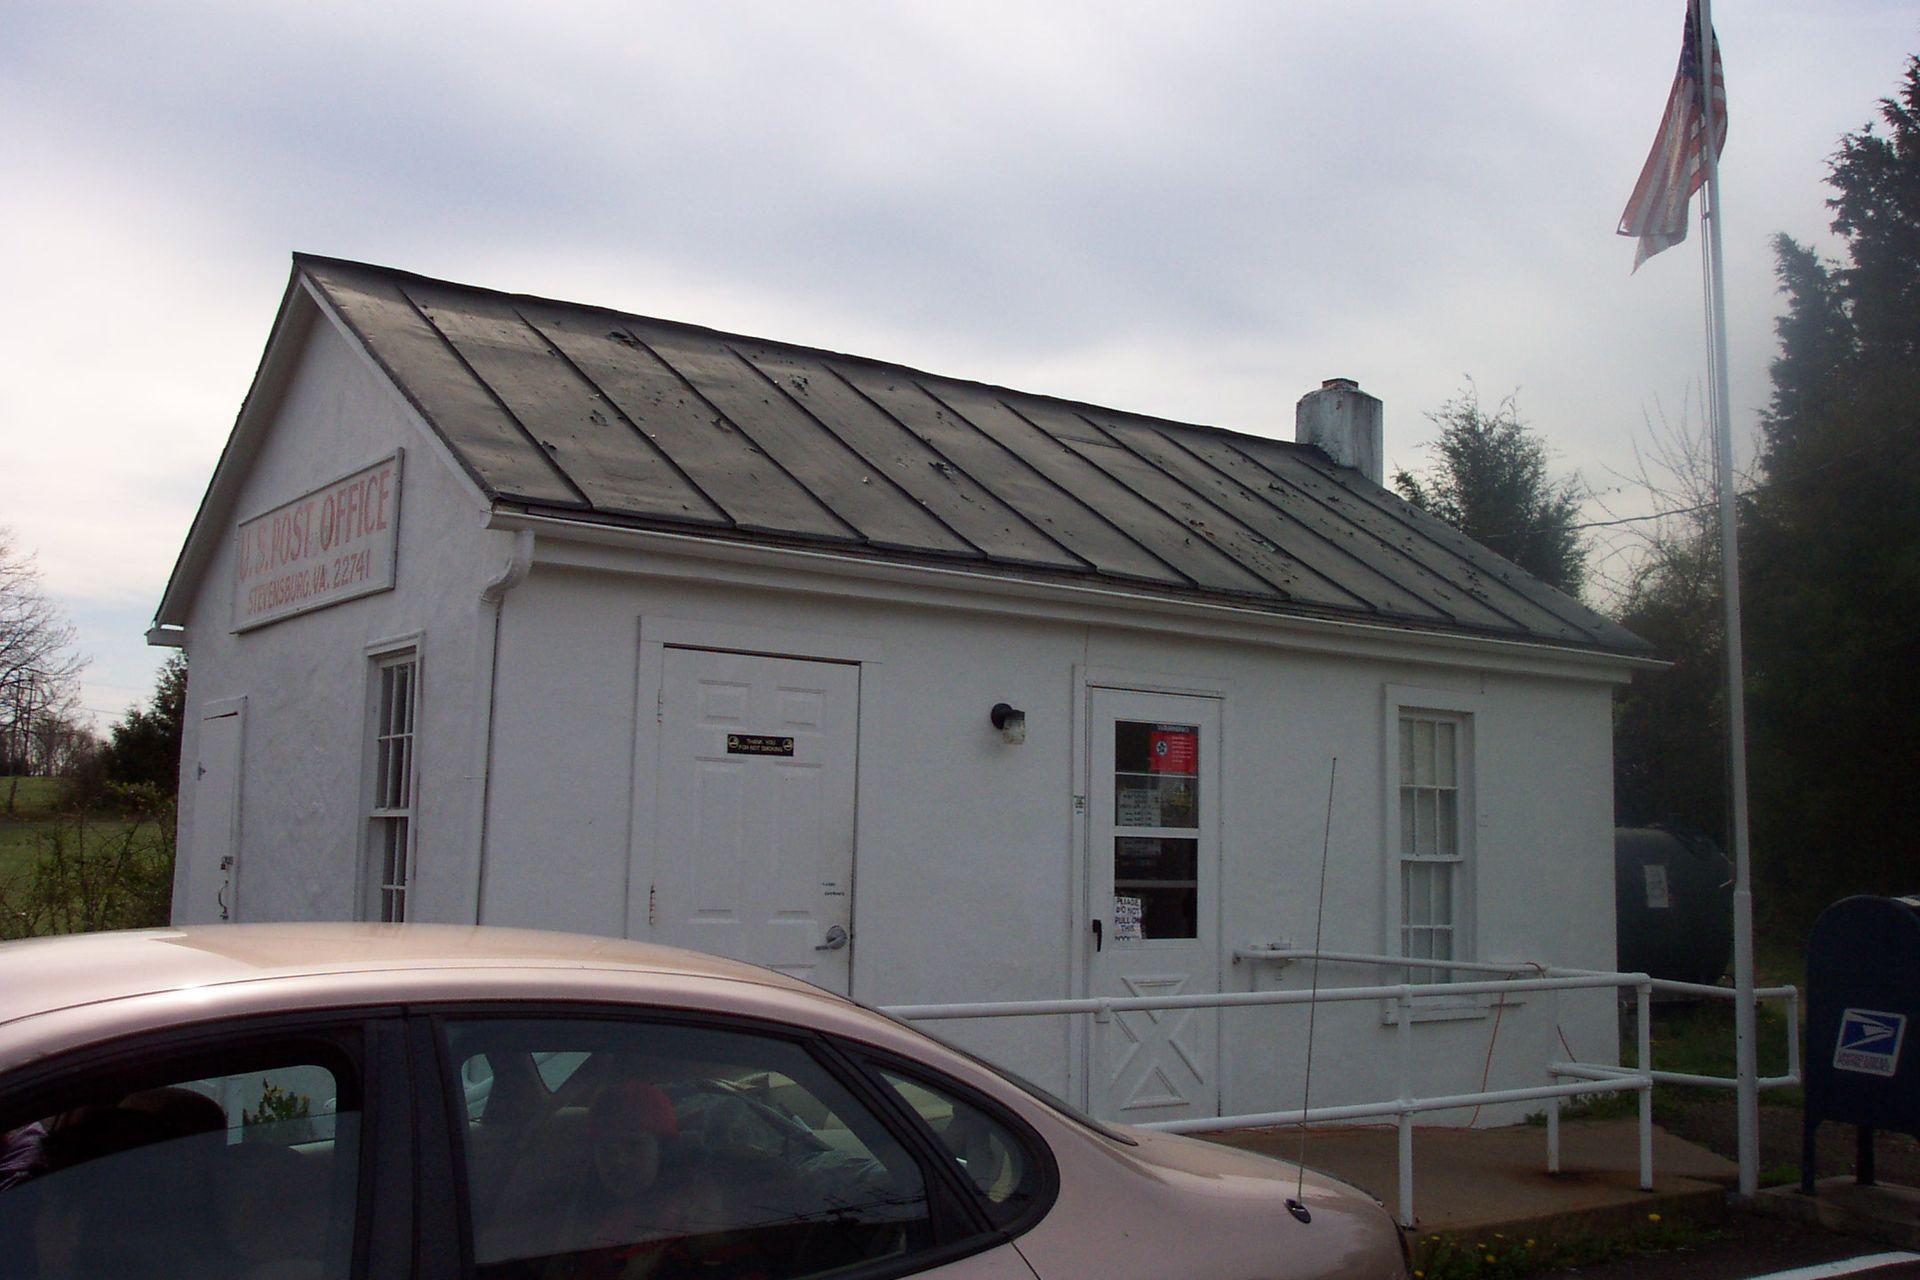 Baja Ringan Wikipedia Stevensburg Post Office Virginia The